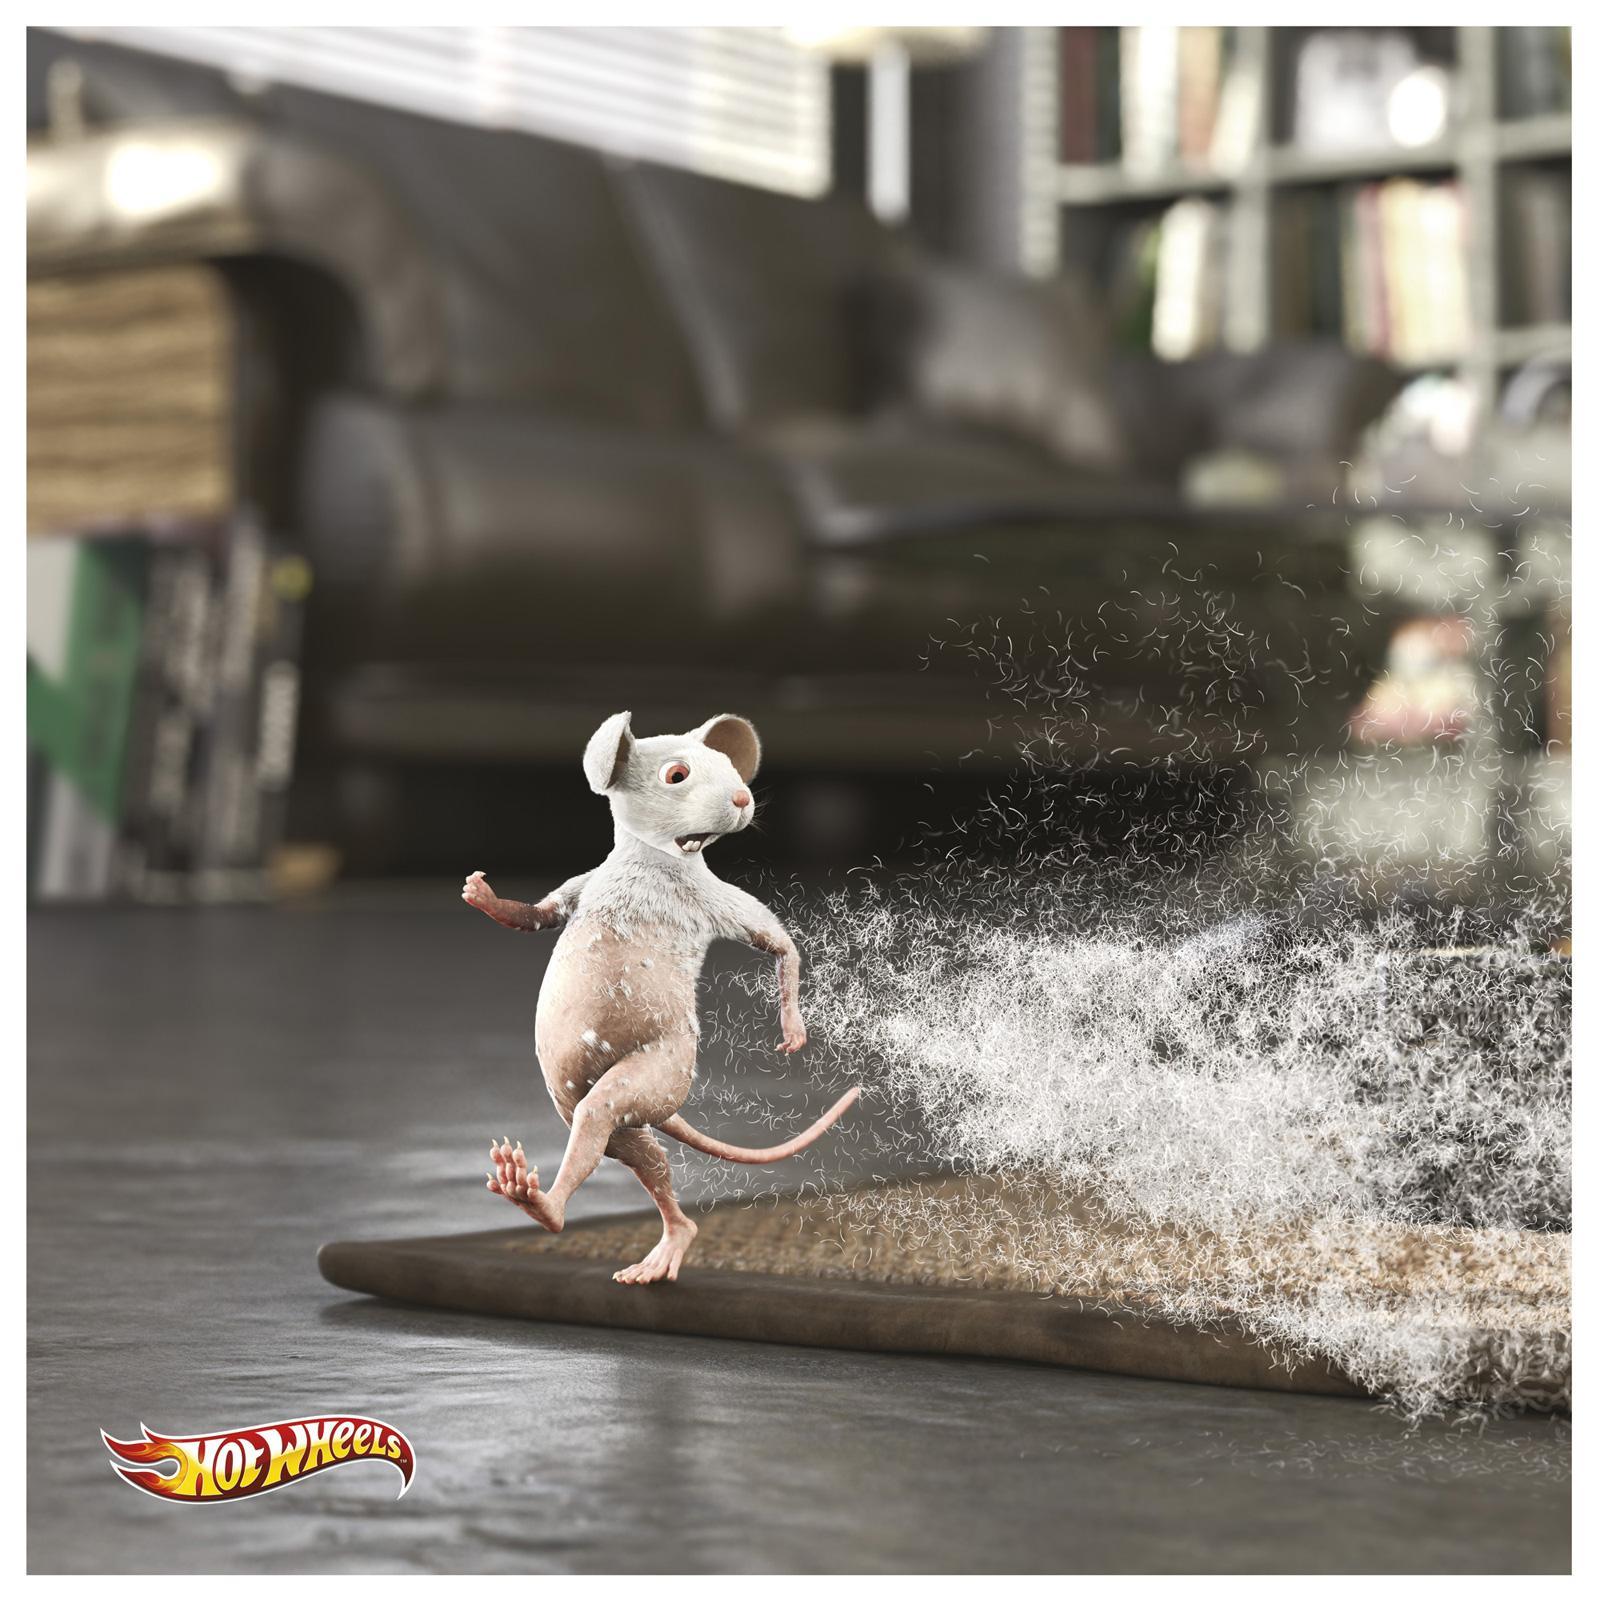 Hotwheels Print Ad -  Baldy